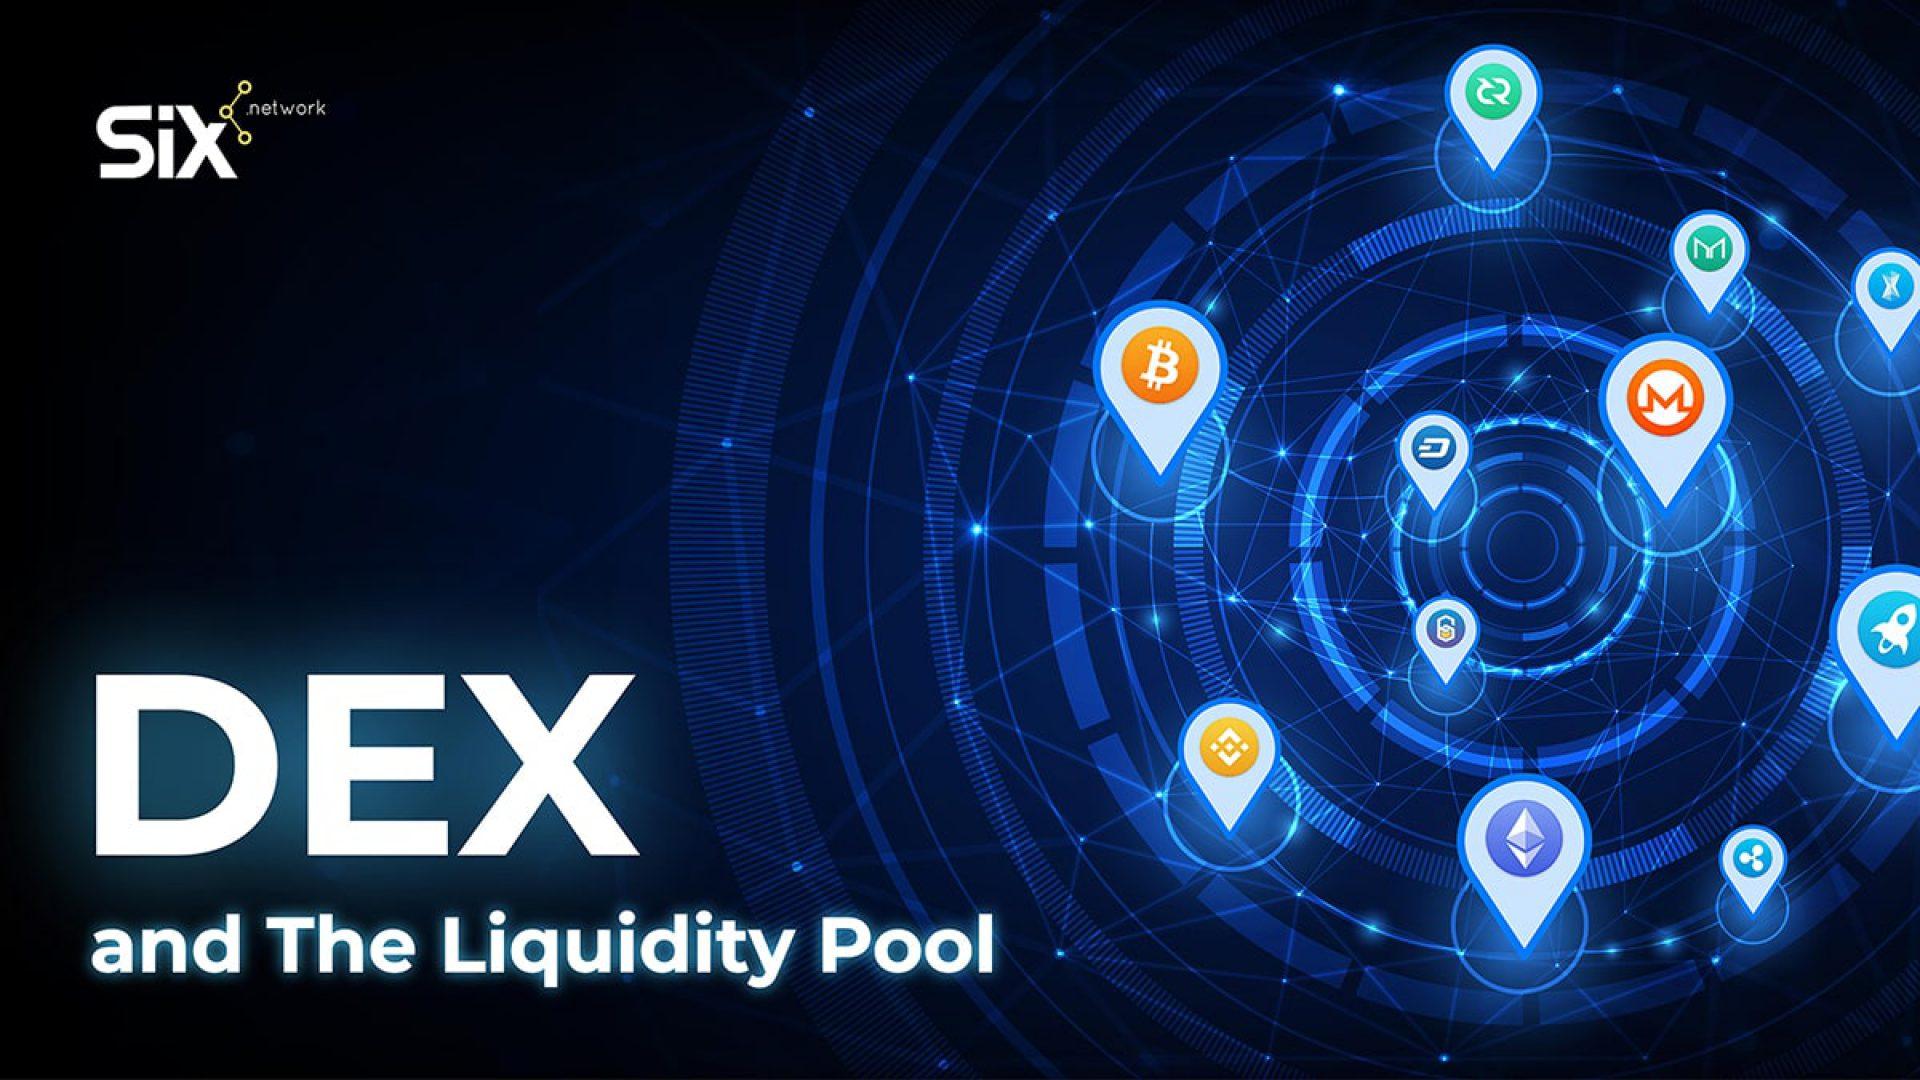 Dex and The Liquidity Pool